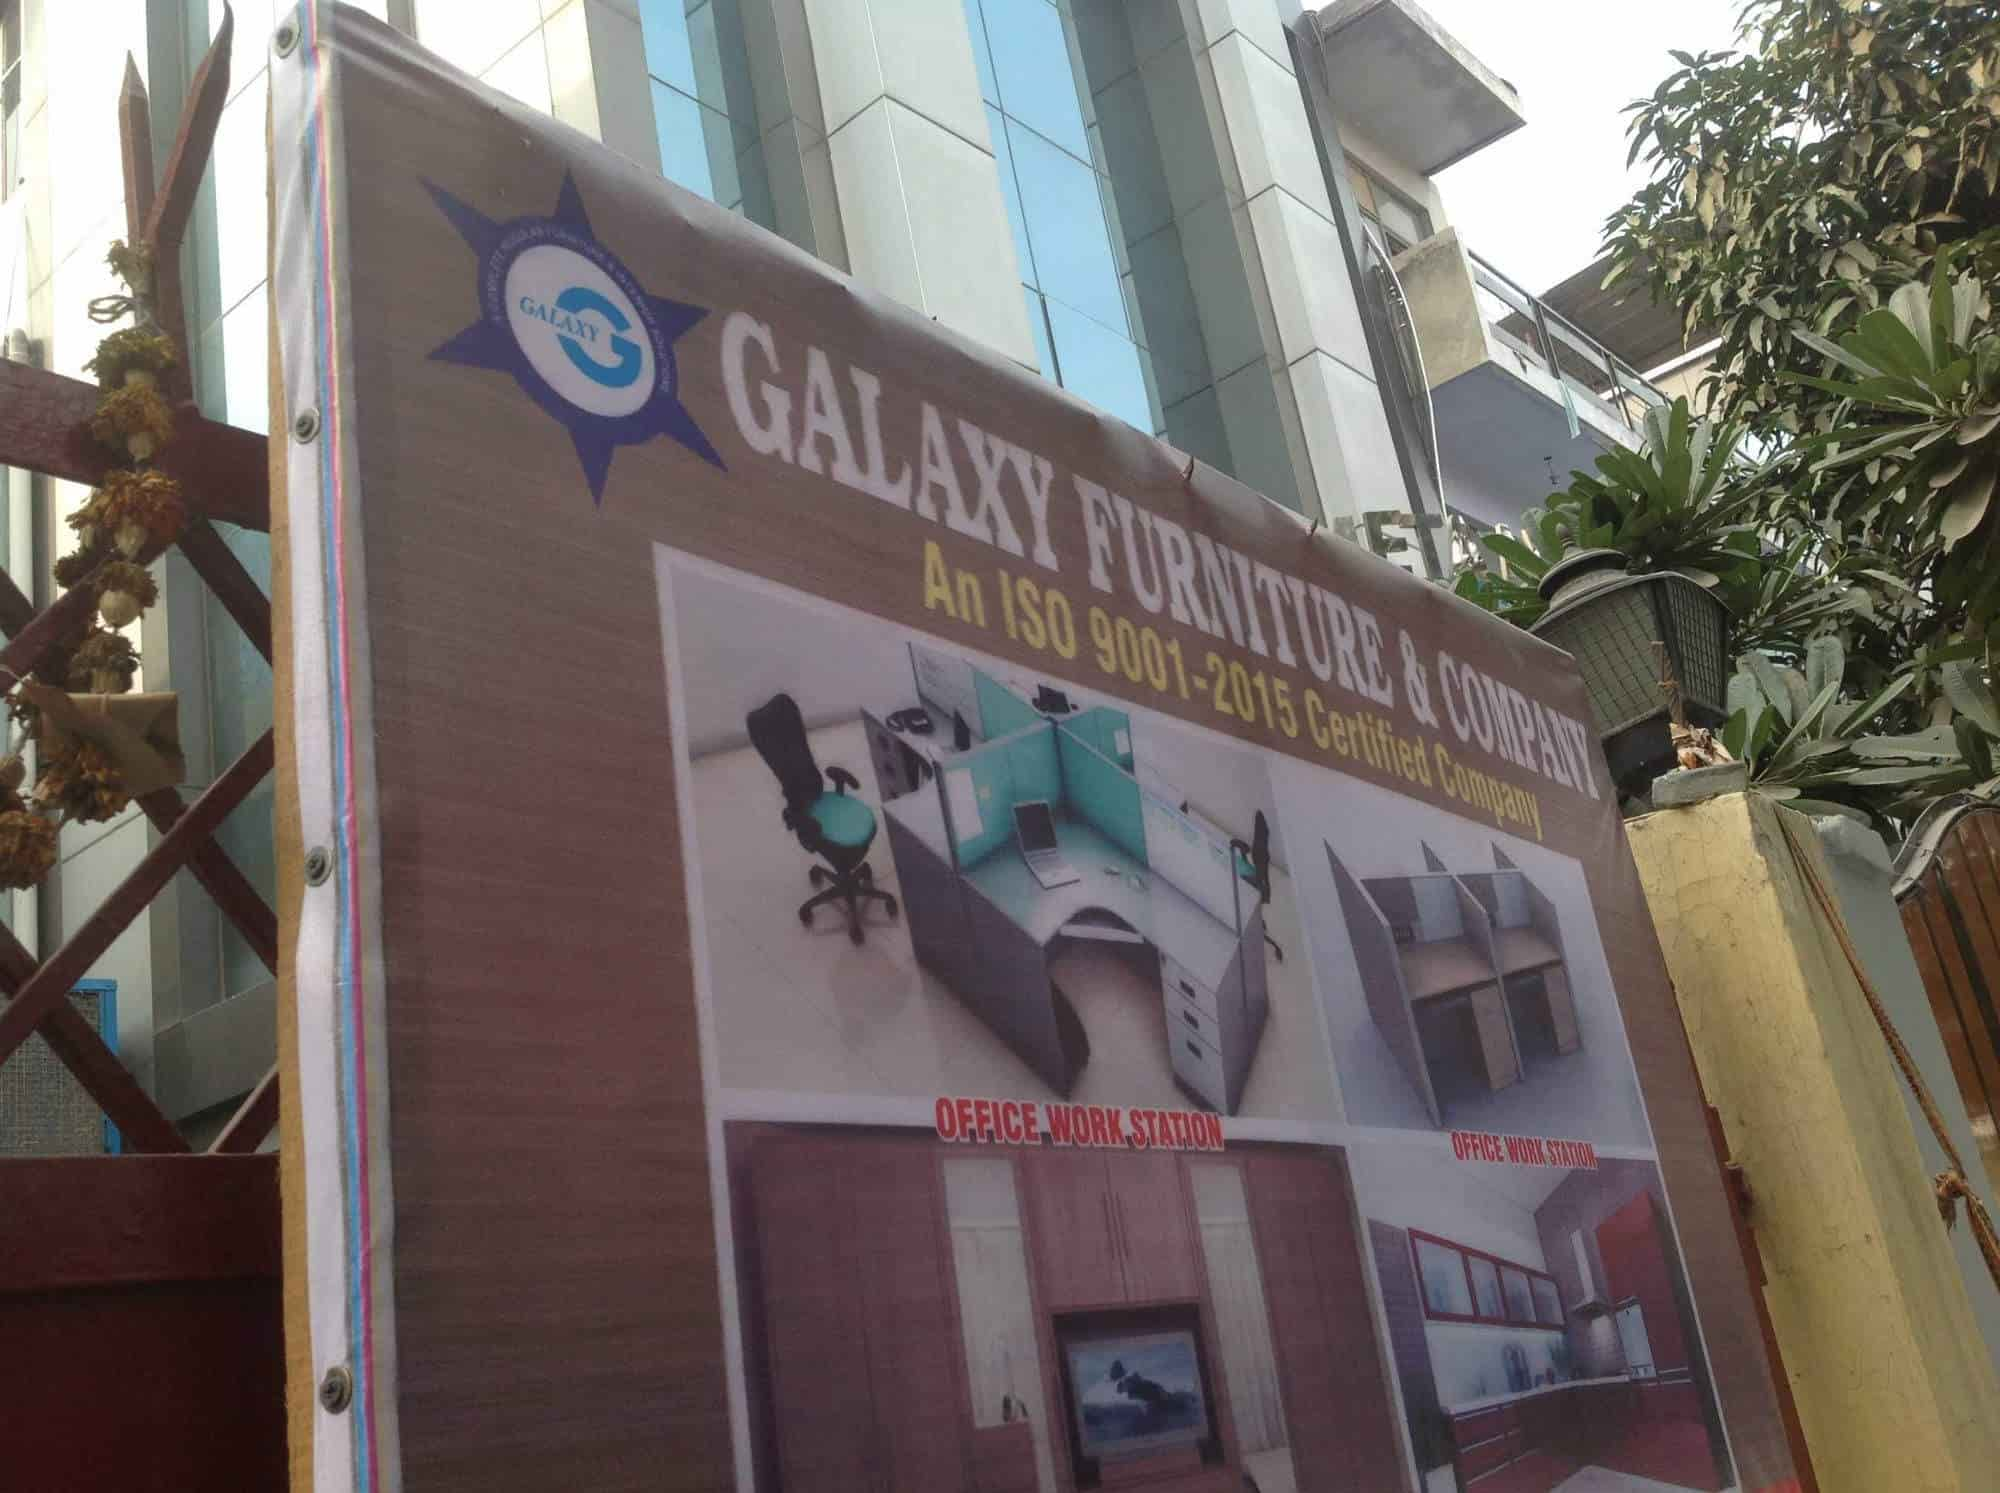 Galaxy Furniture & Company, Noida Sector 63 - Office